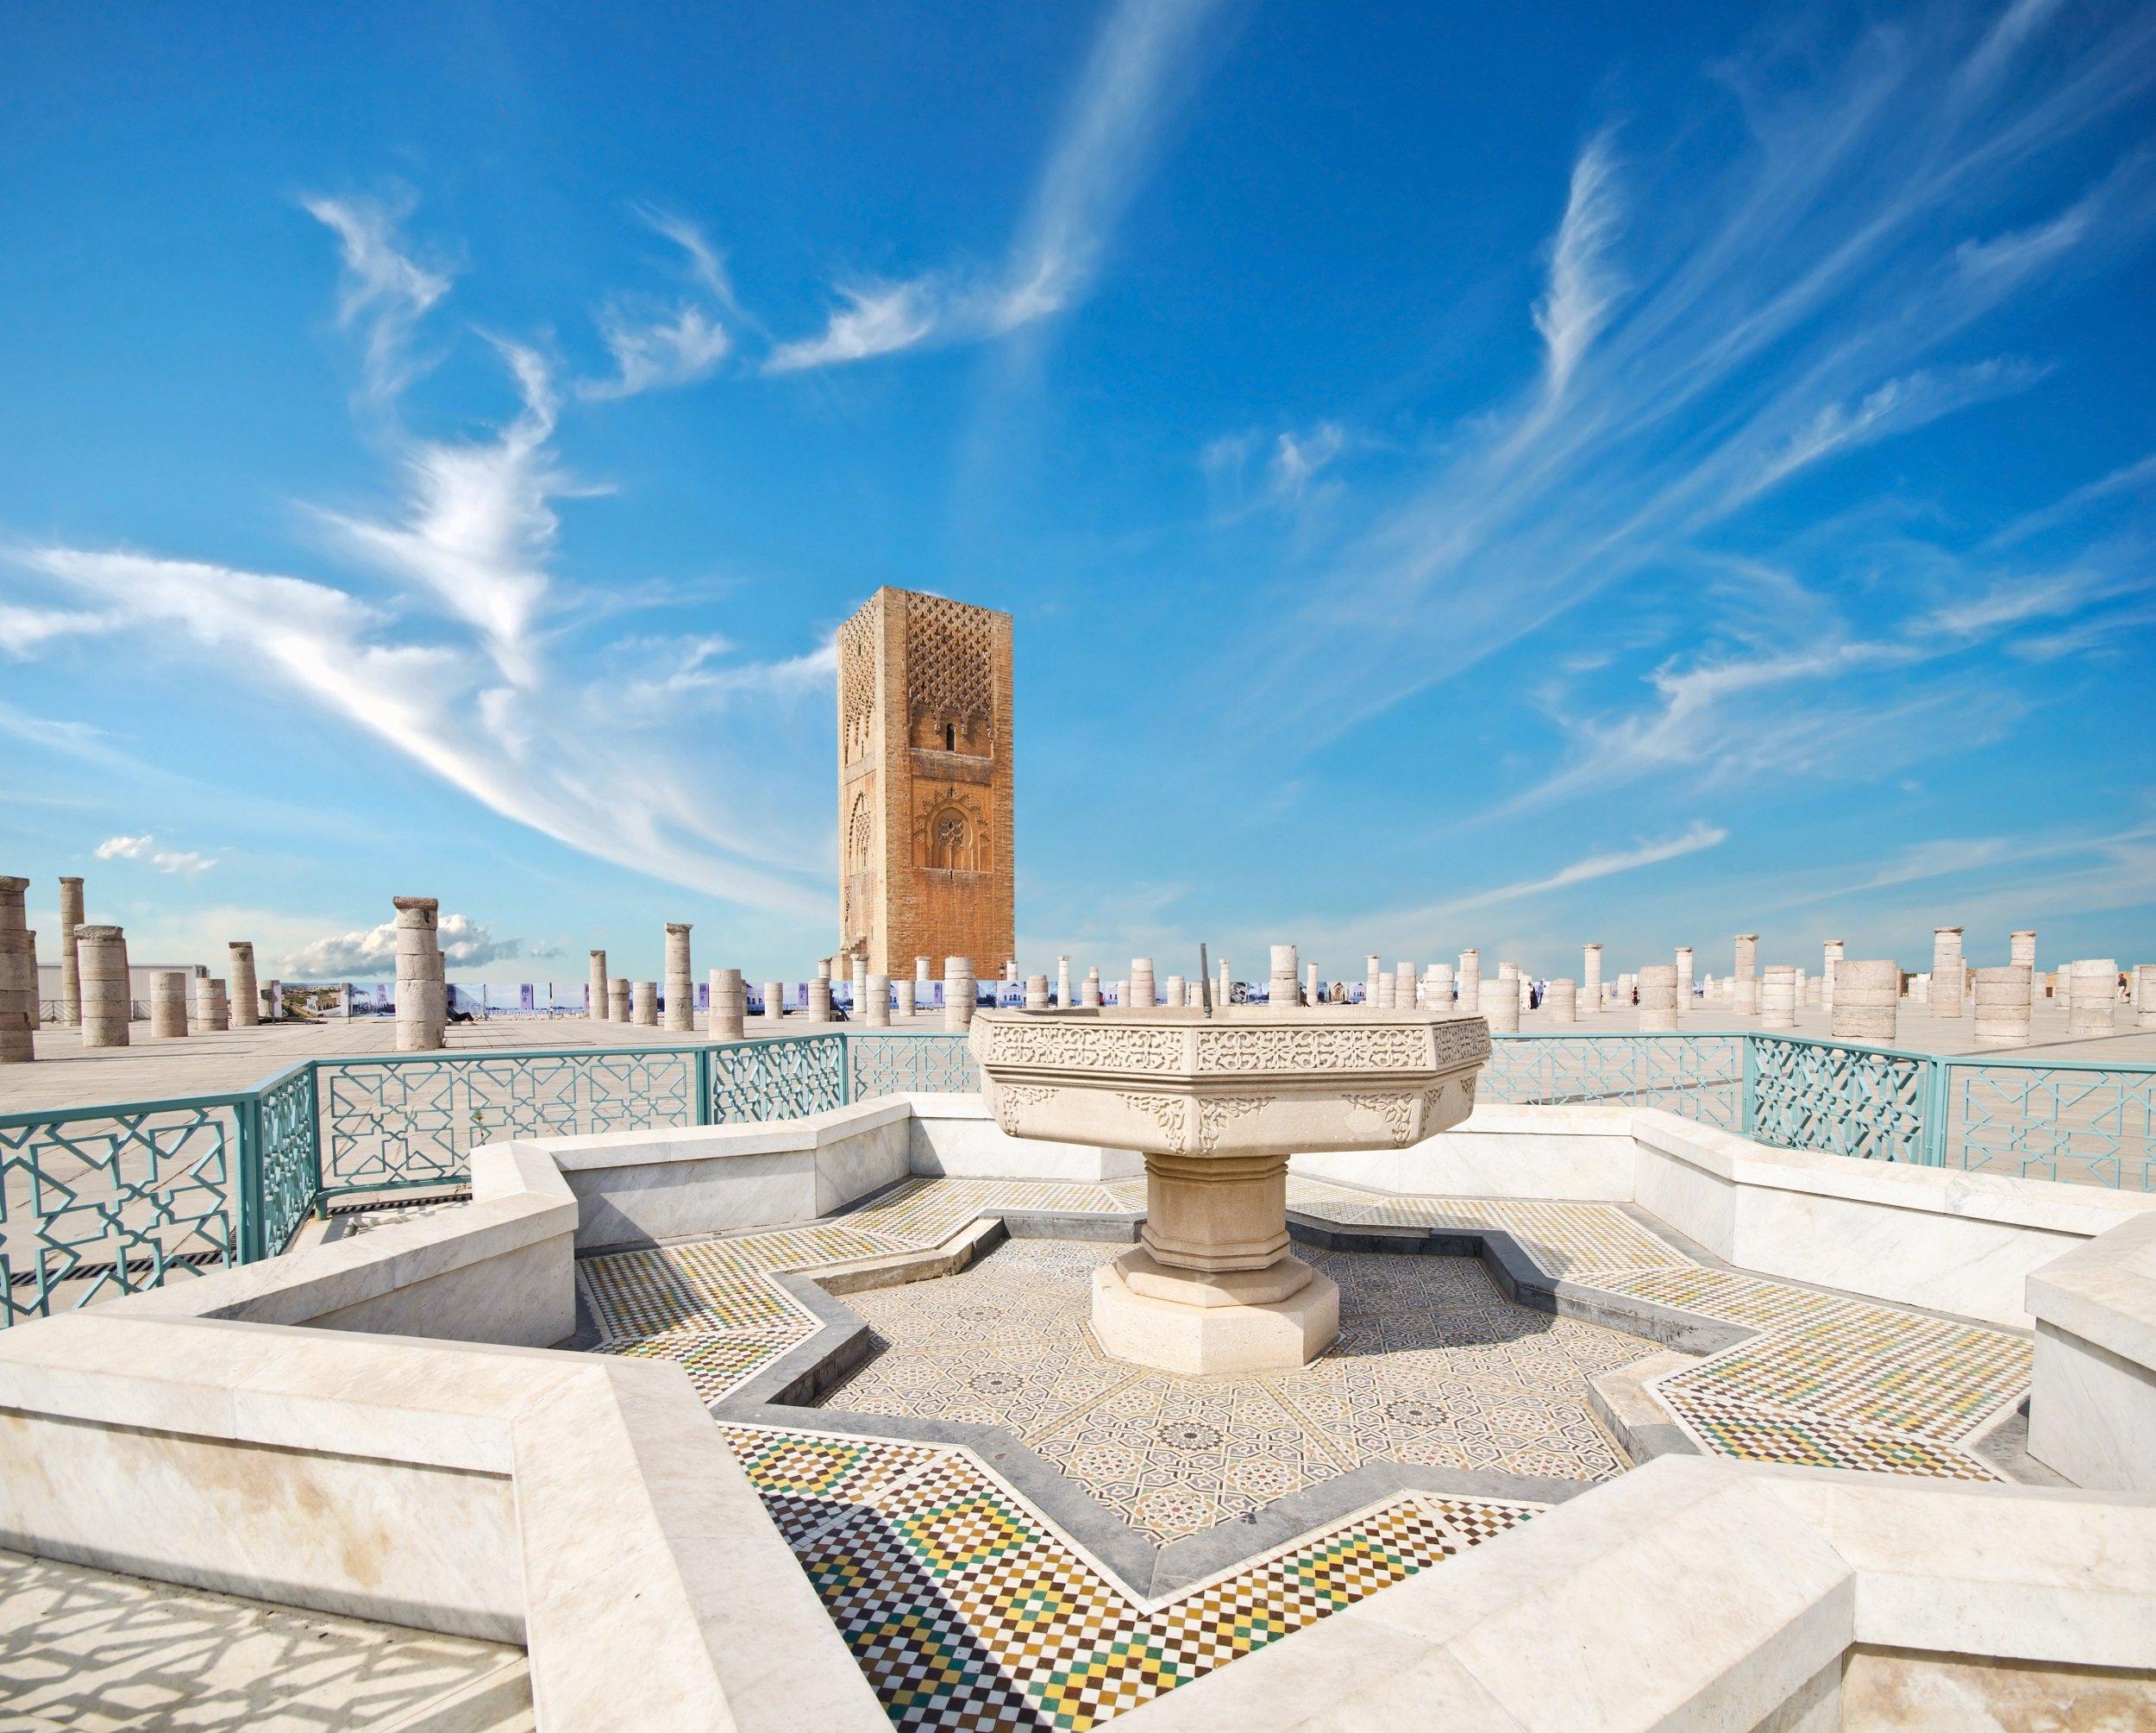 Rabat-private-tour-from-casablanca_7